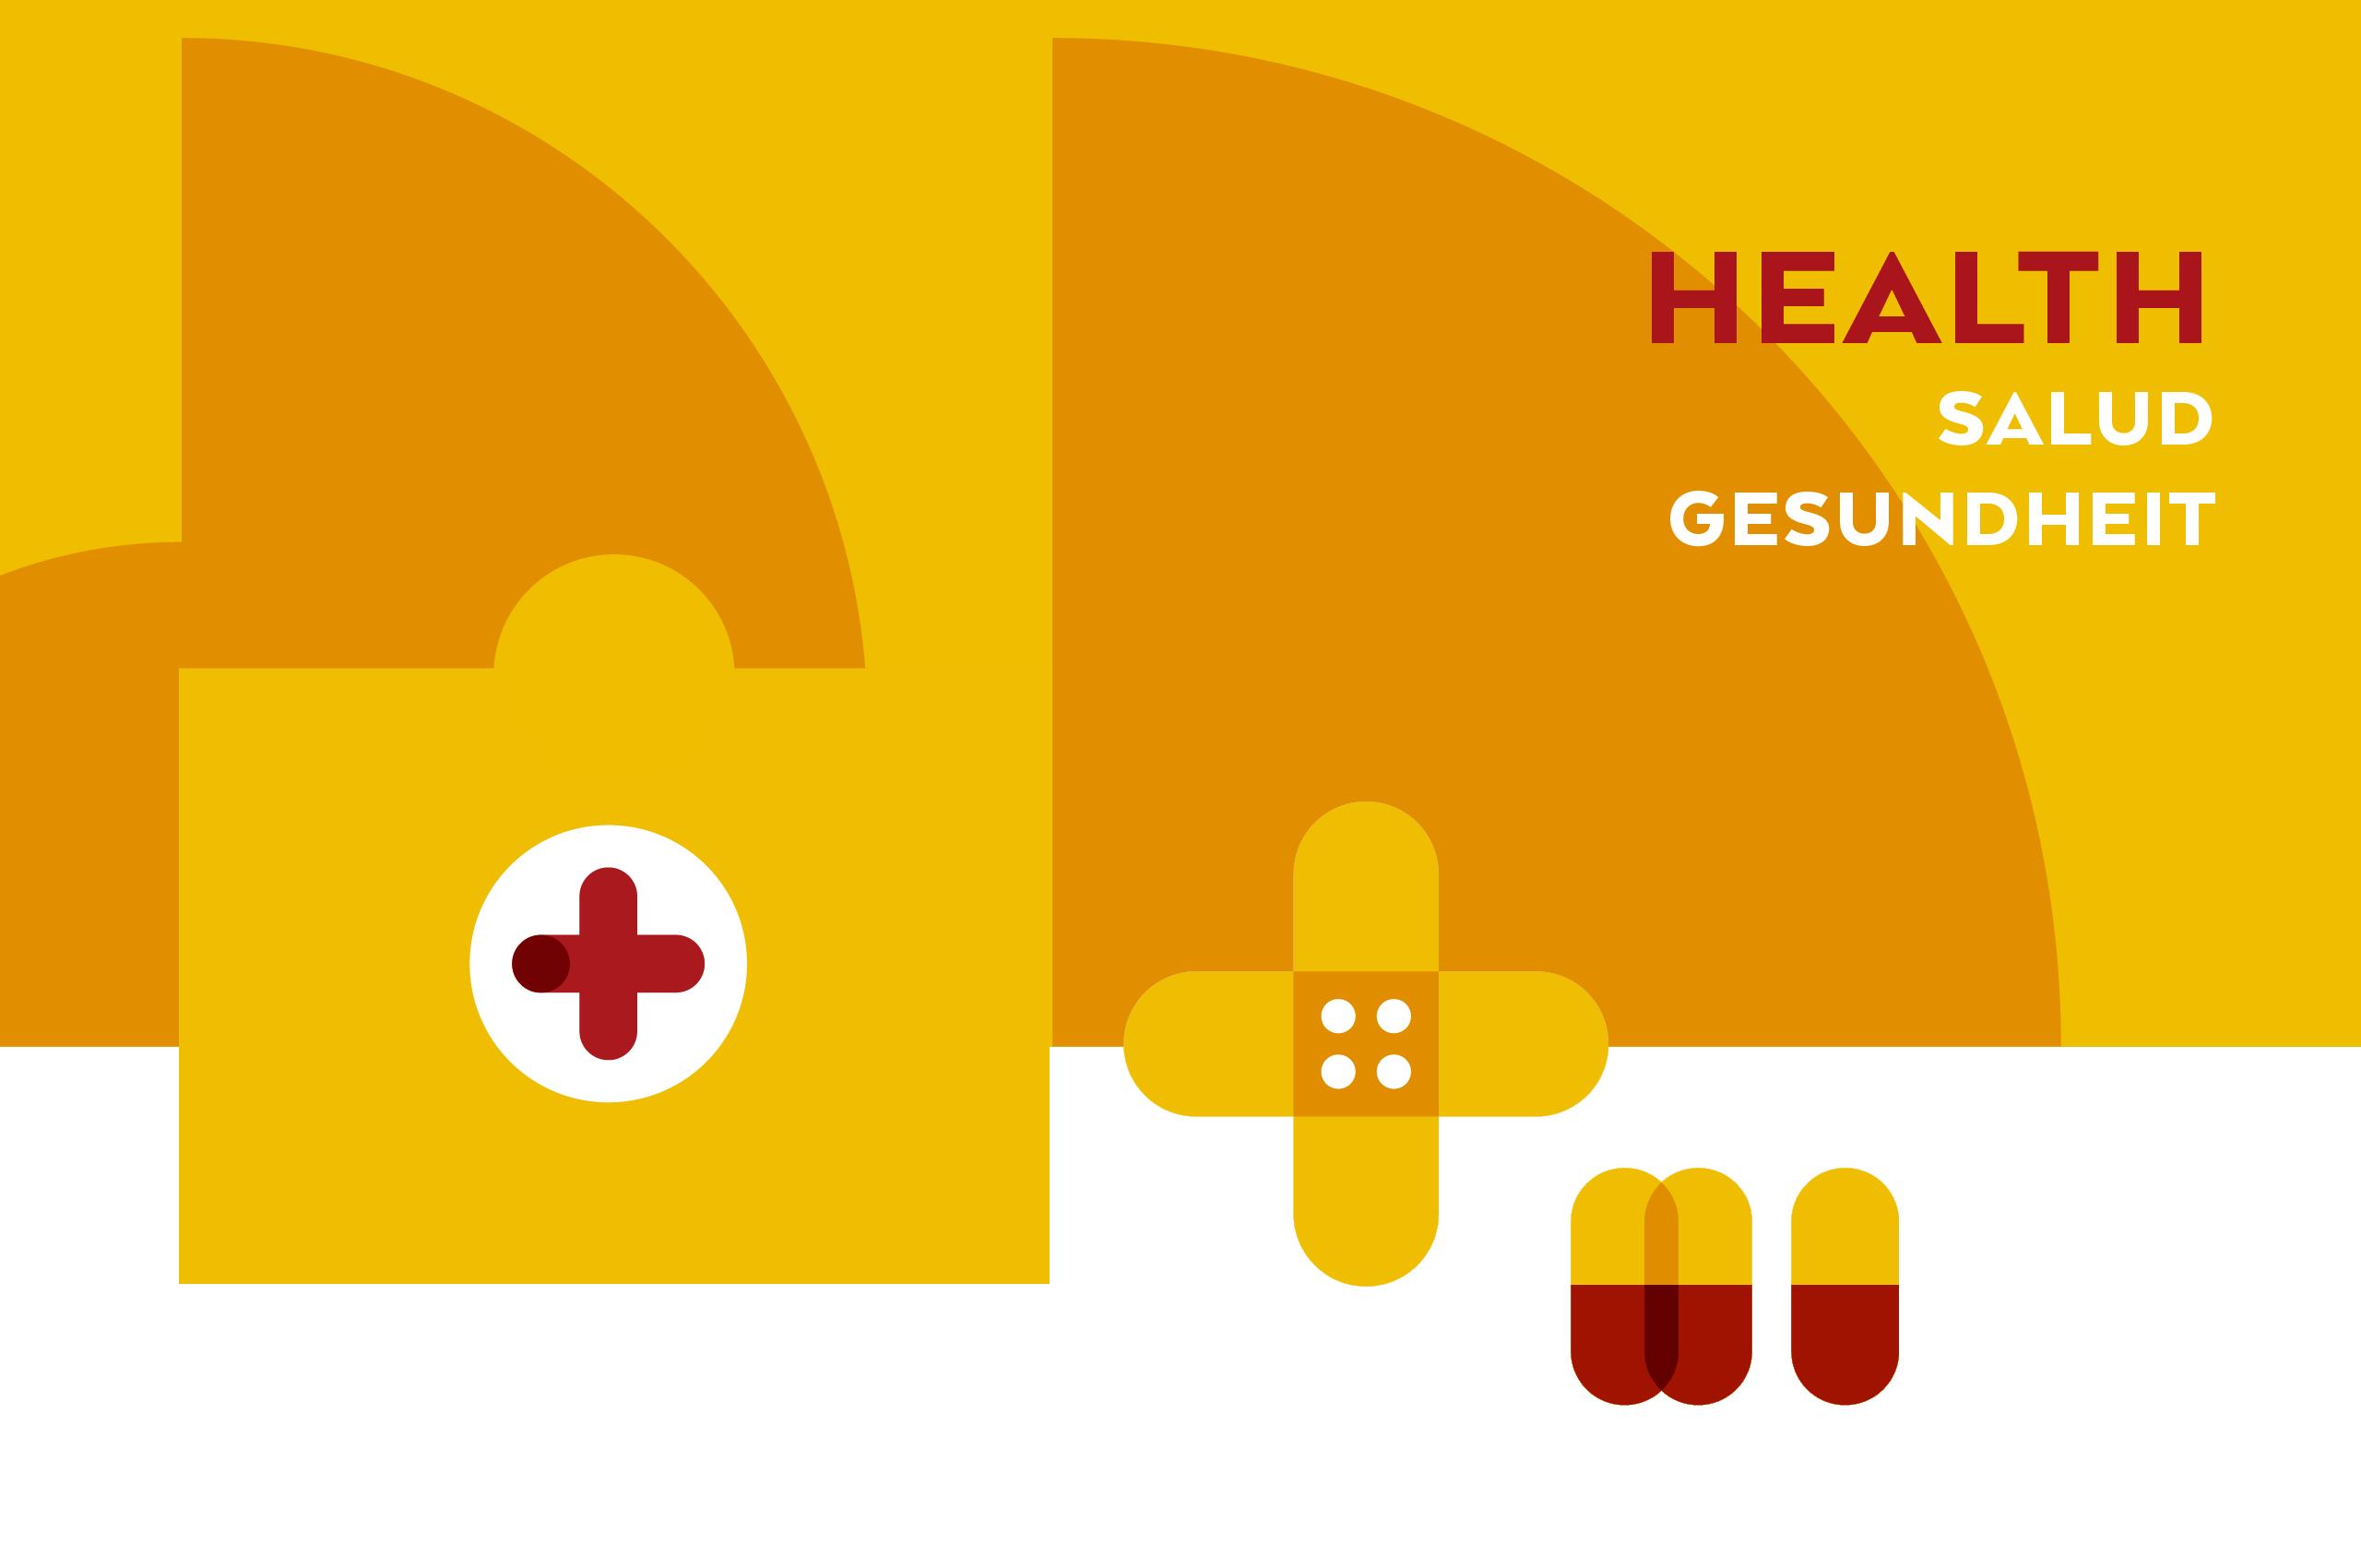 ocio7-illustration-health-buero-ink-graphic